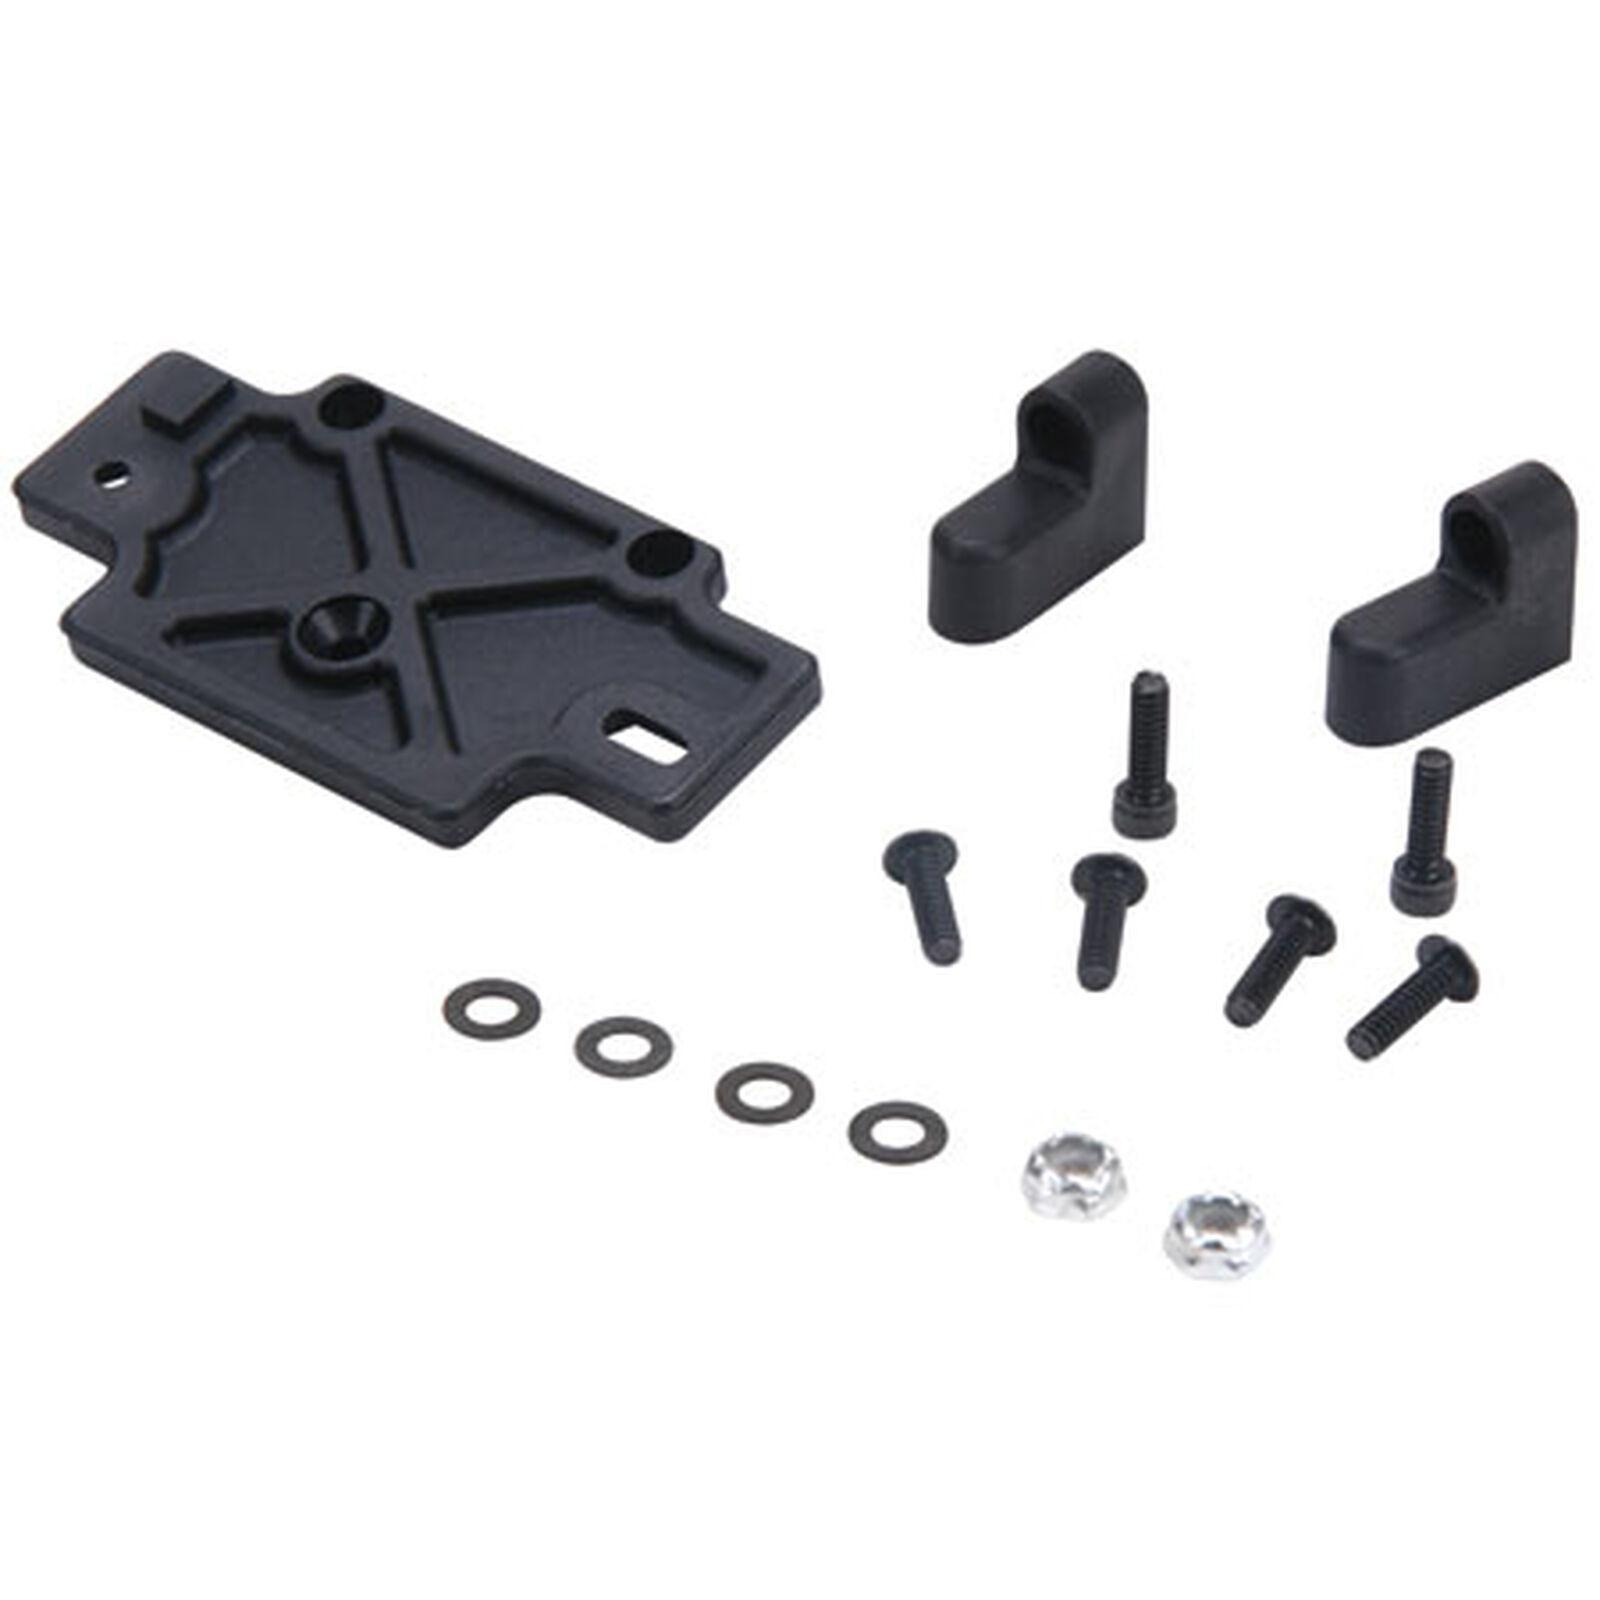 Servo Mounts, Plate and Hardware: CCR, NCR SE